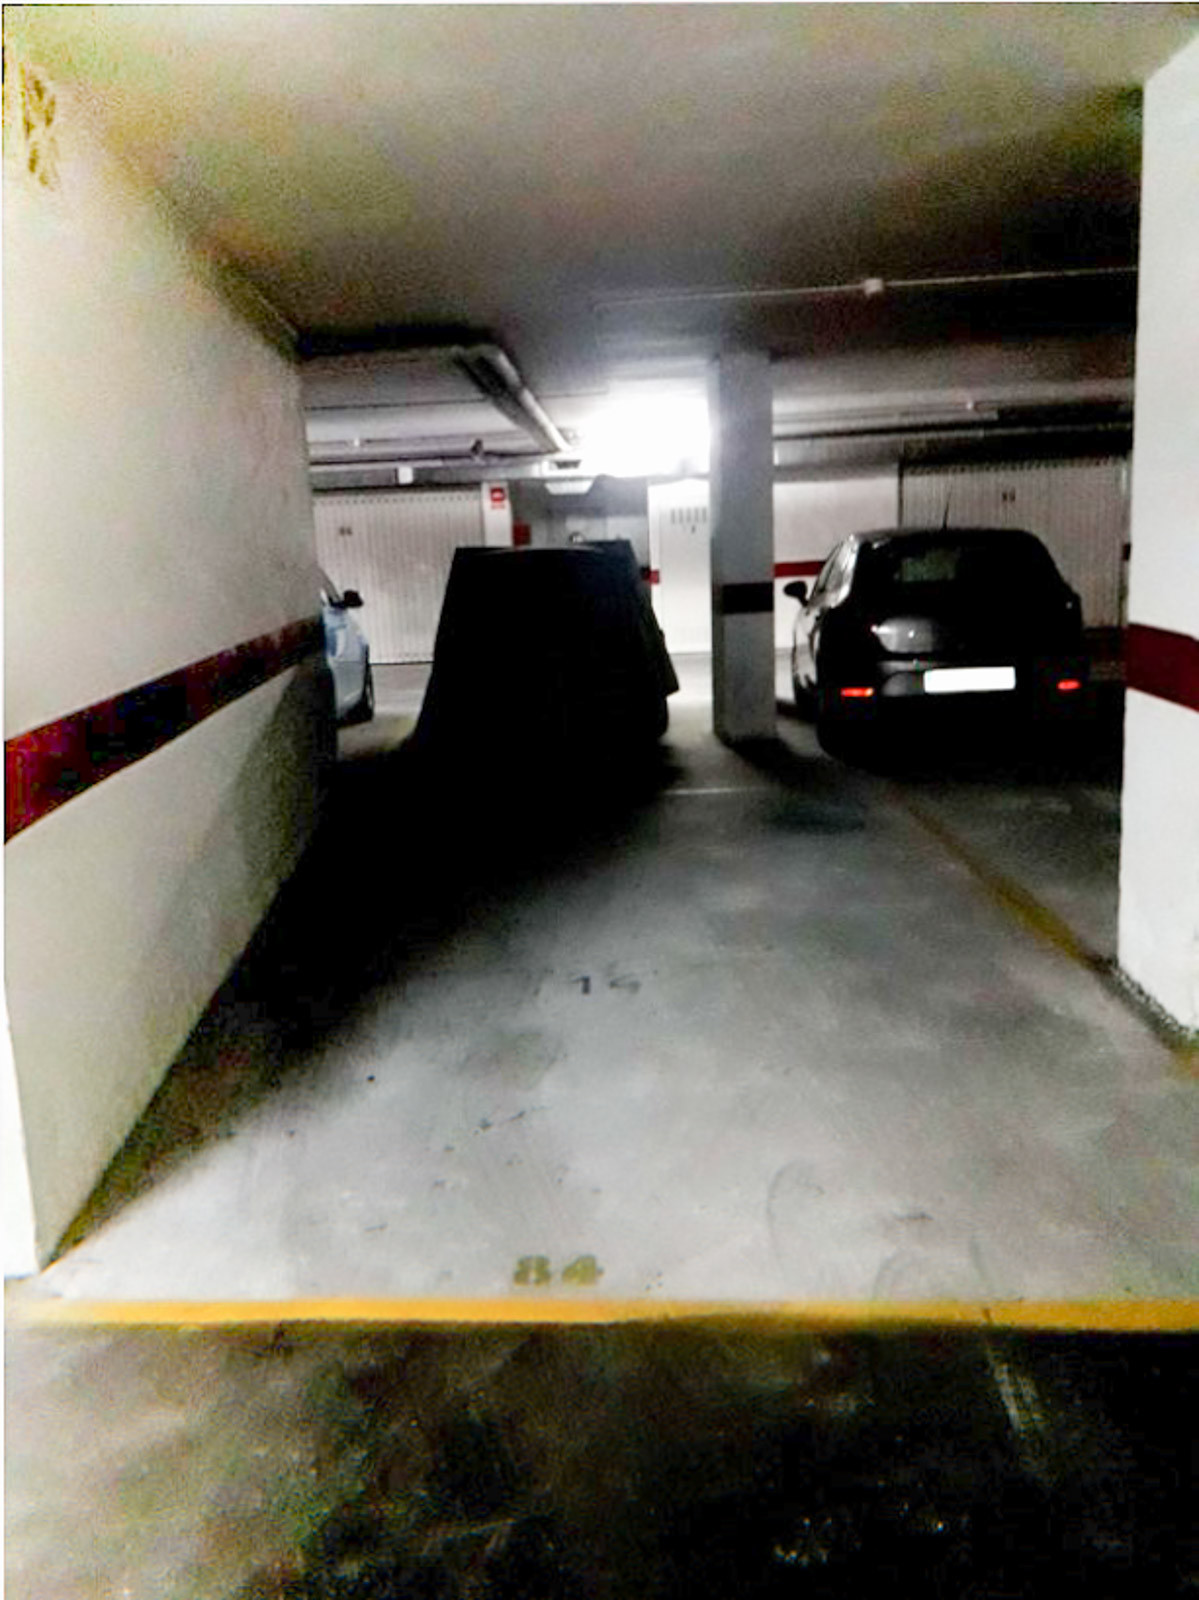 GARAGE PLAZA IN LAS PALMERAS DE ERASA URBANIZATION, BENALMADENA, MALAGA   Parking space of 14.75 m2,,Spain